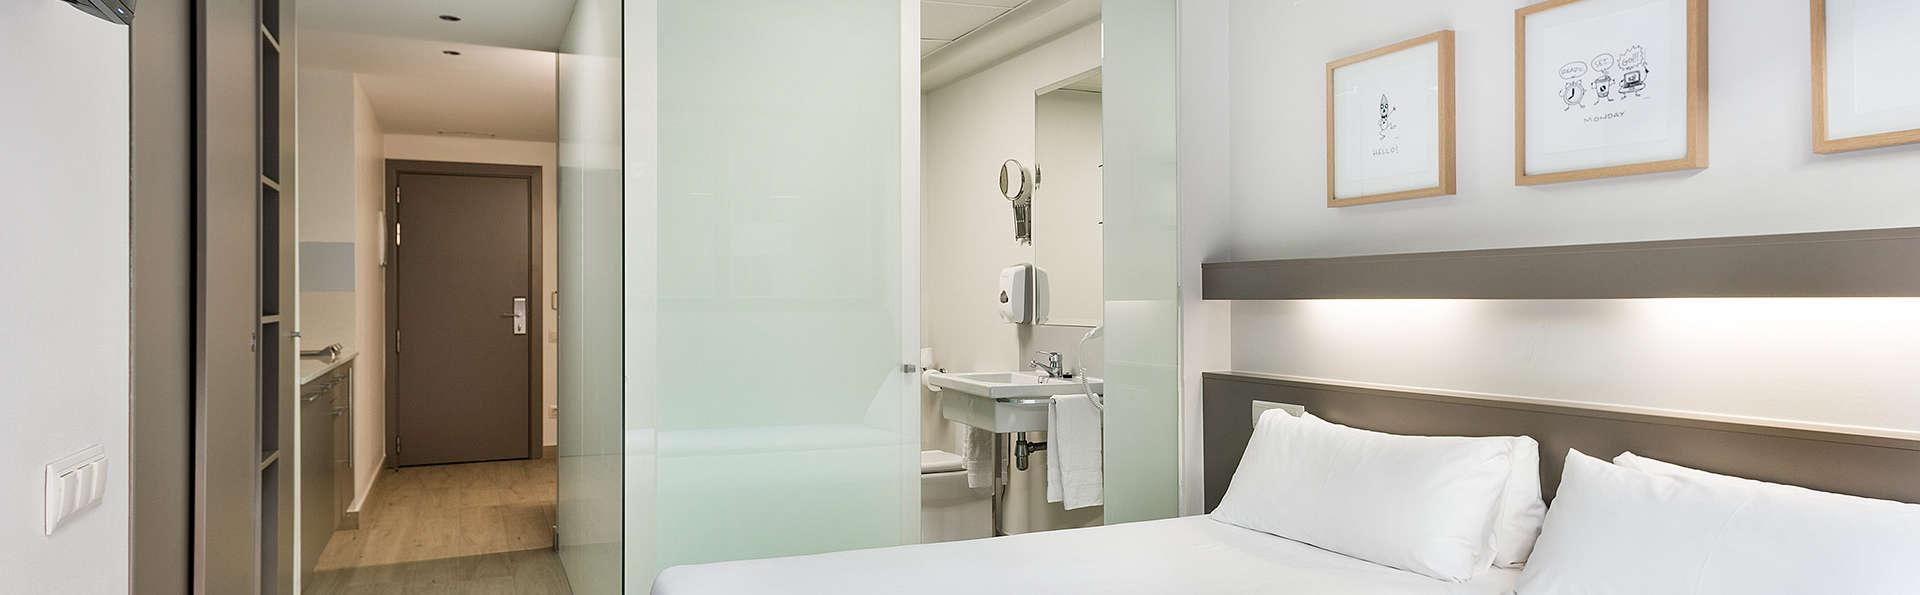 week end barcelone avec acc s la salle de fitness. Black Bedroom Furniture Sets. Home Design Ideas